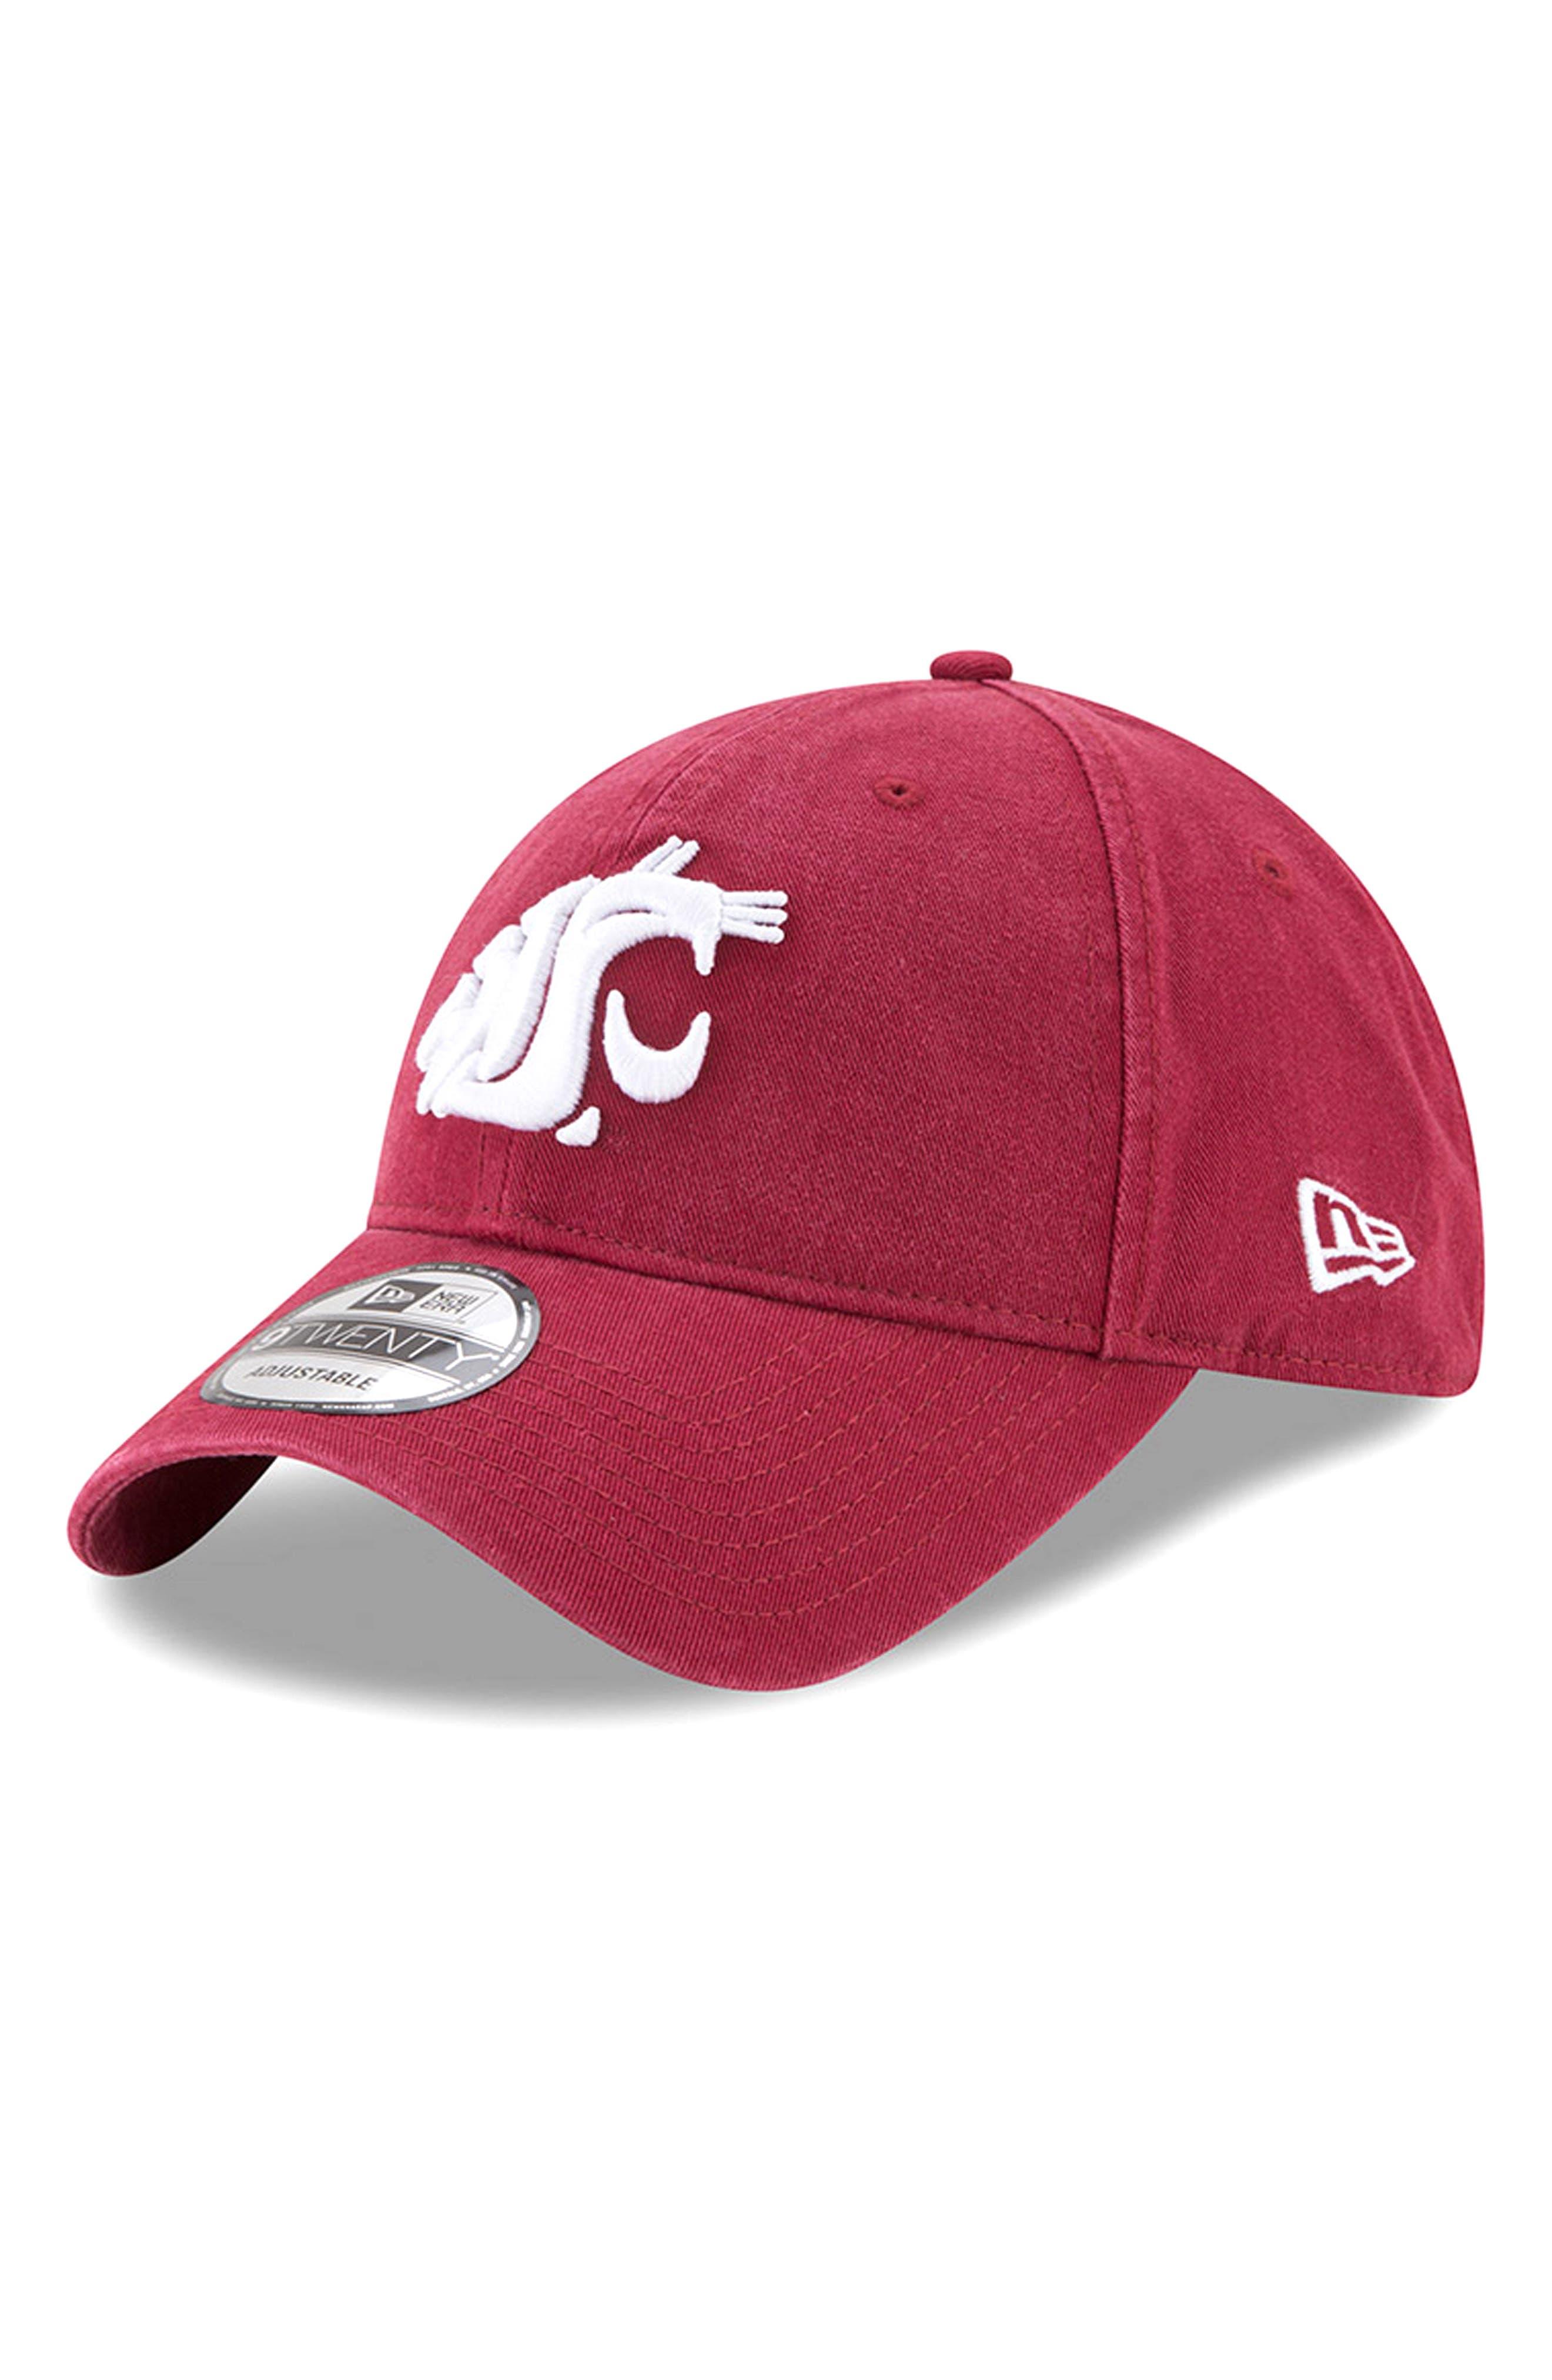 Alternate Image 1 Selected - New Era Collegiate Core Classic - Washington State Cougars Baseball Cap